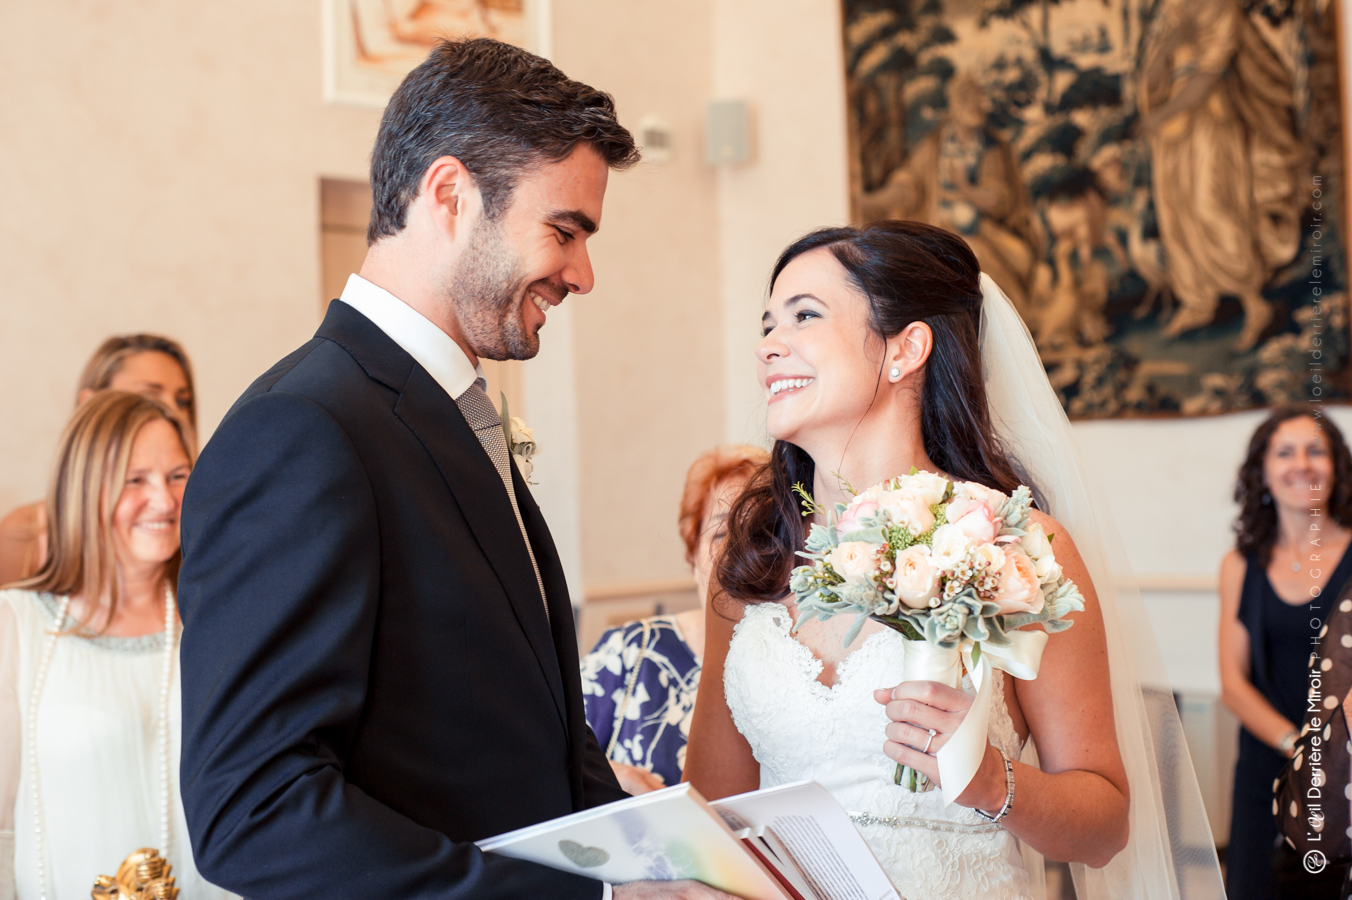 Photographe-mariage-Lorgues-83-KS-038